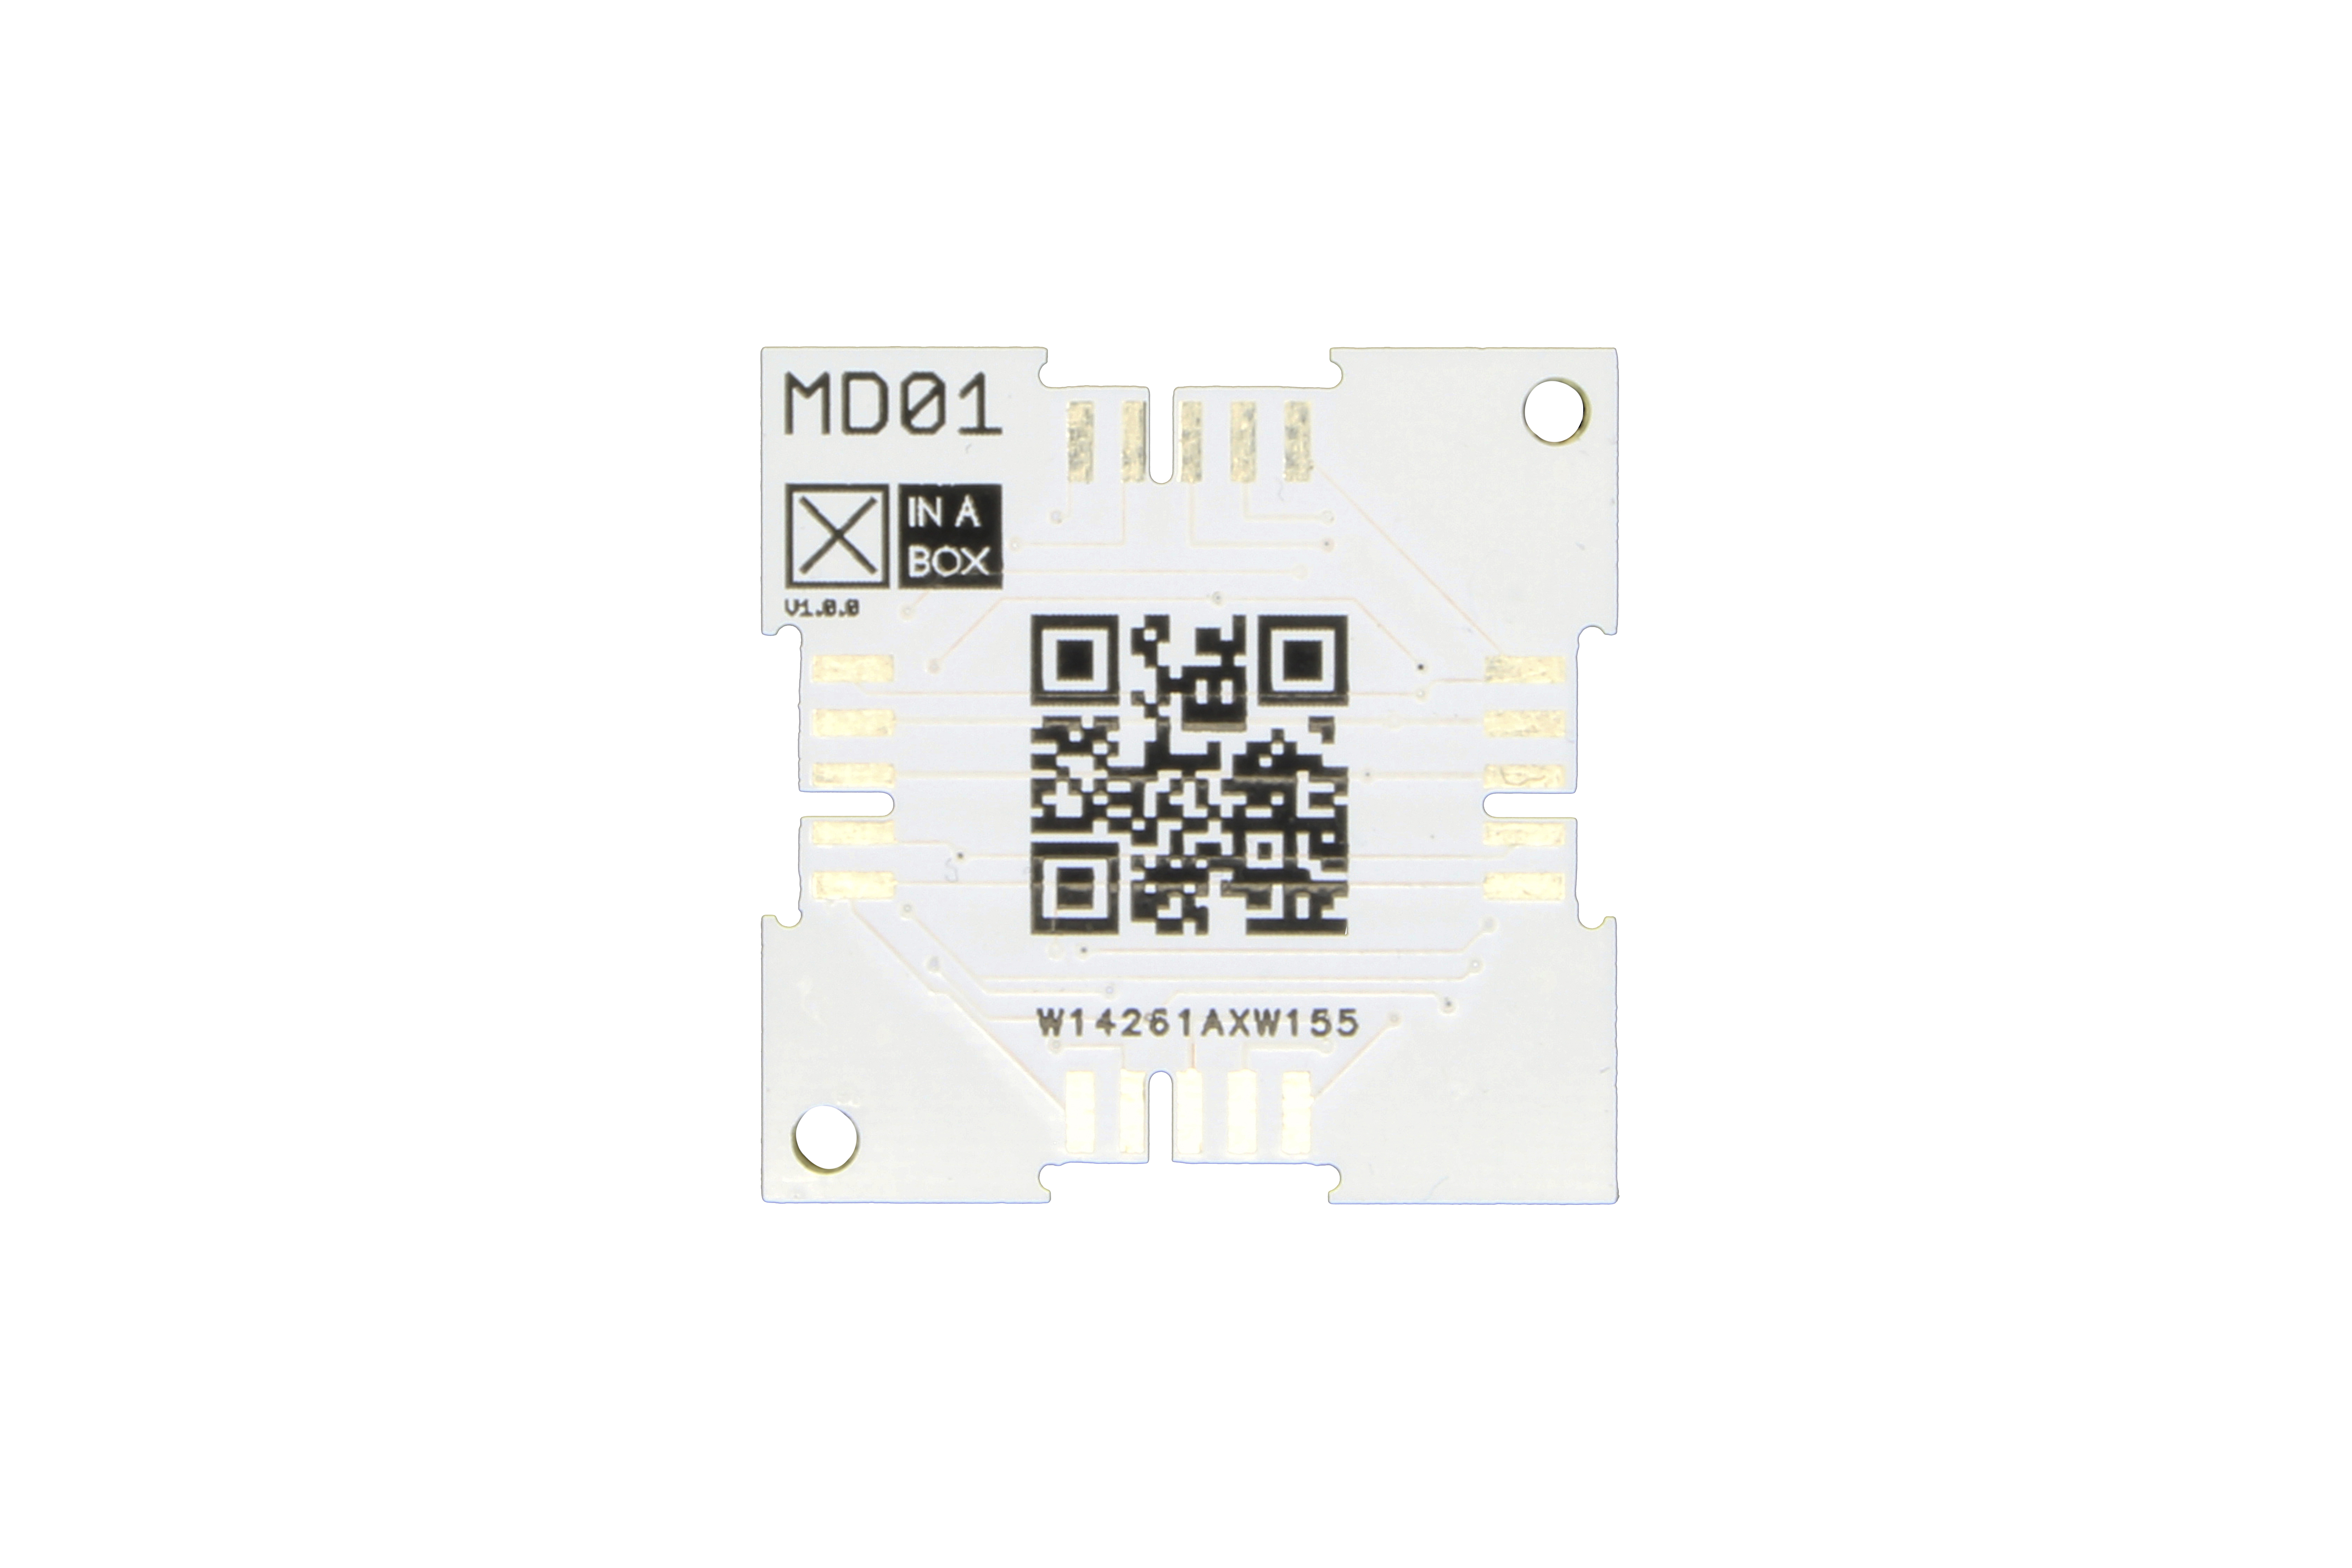 Espaceur Xinabox MD01